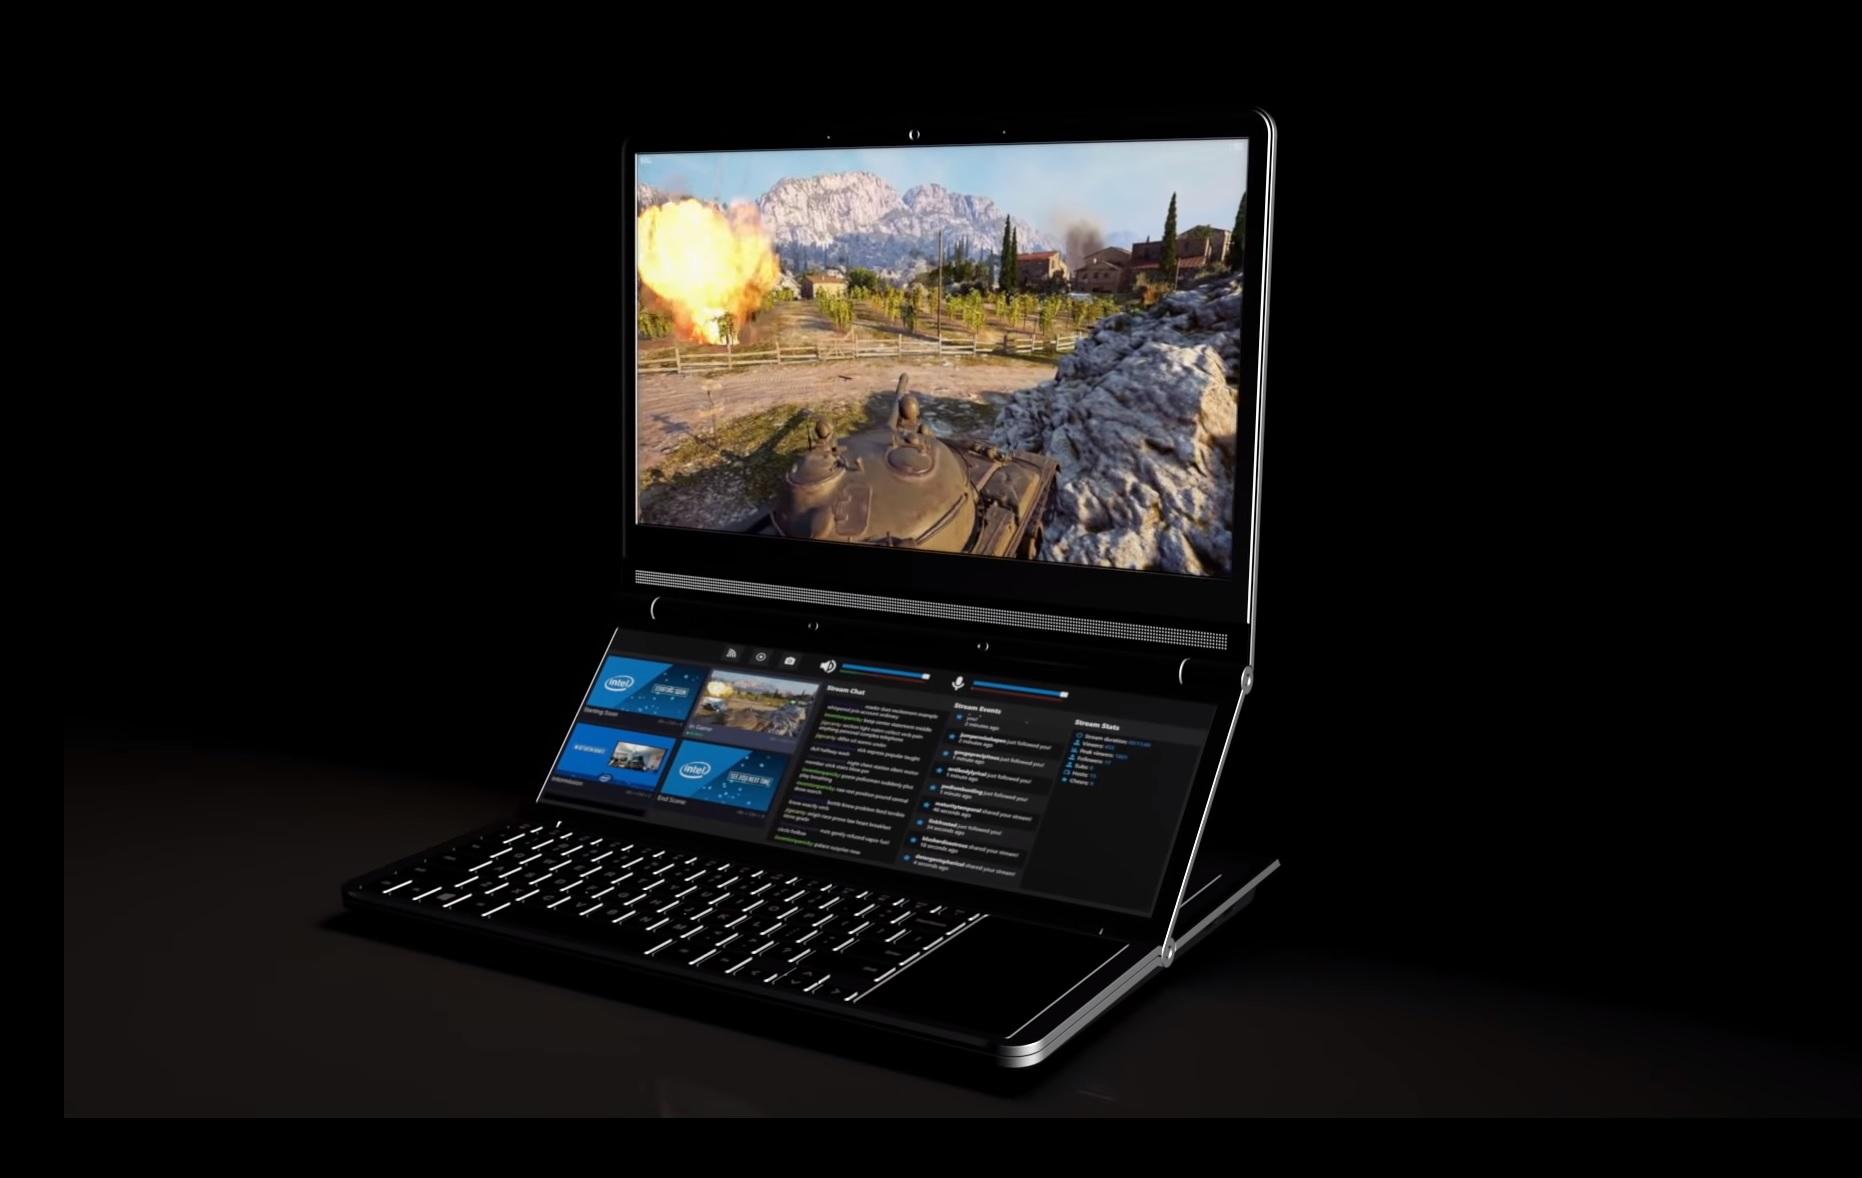 Intel zeigt noch cooleres Dual-Display-Laptop-Design als Asus